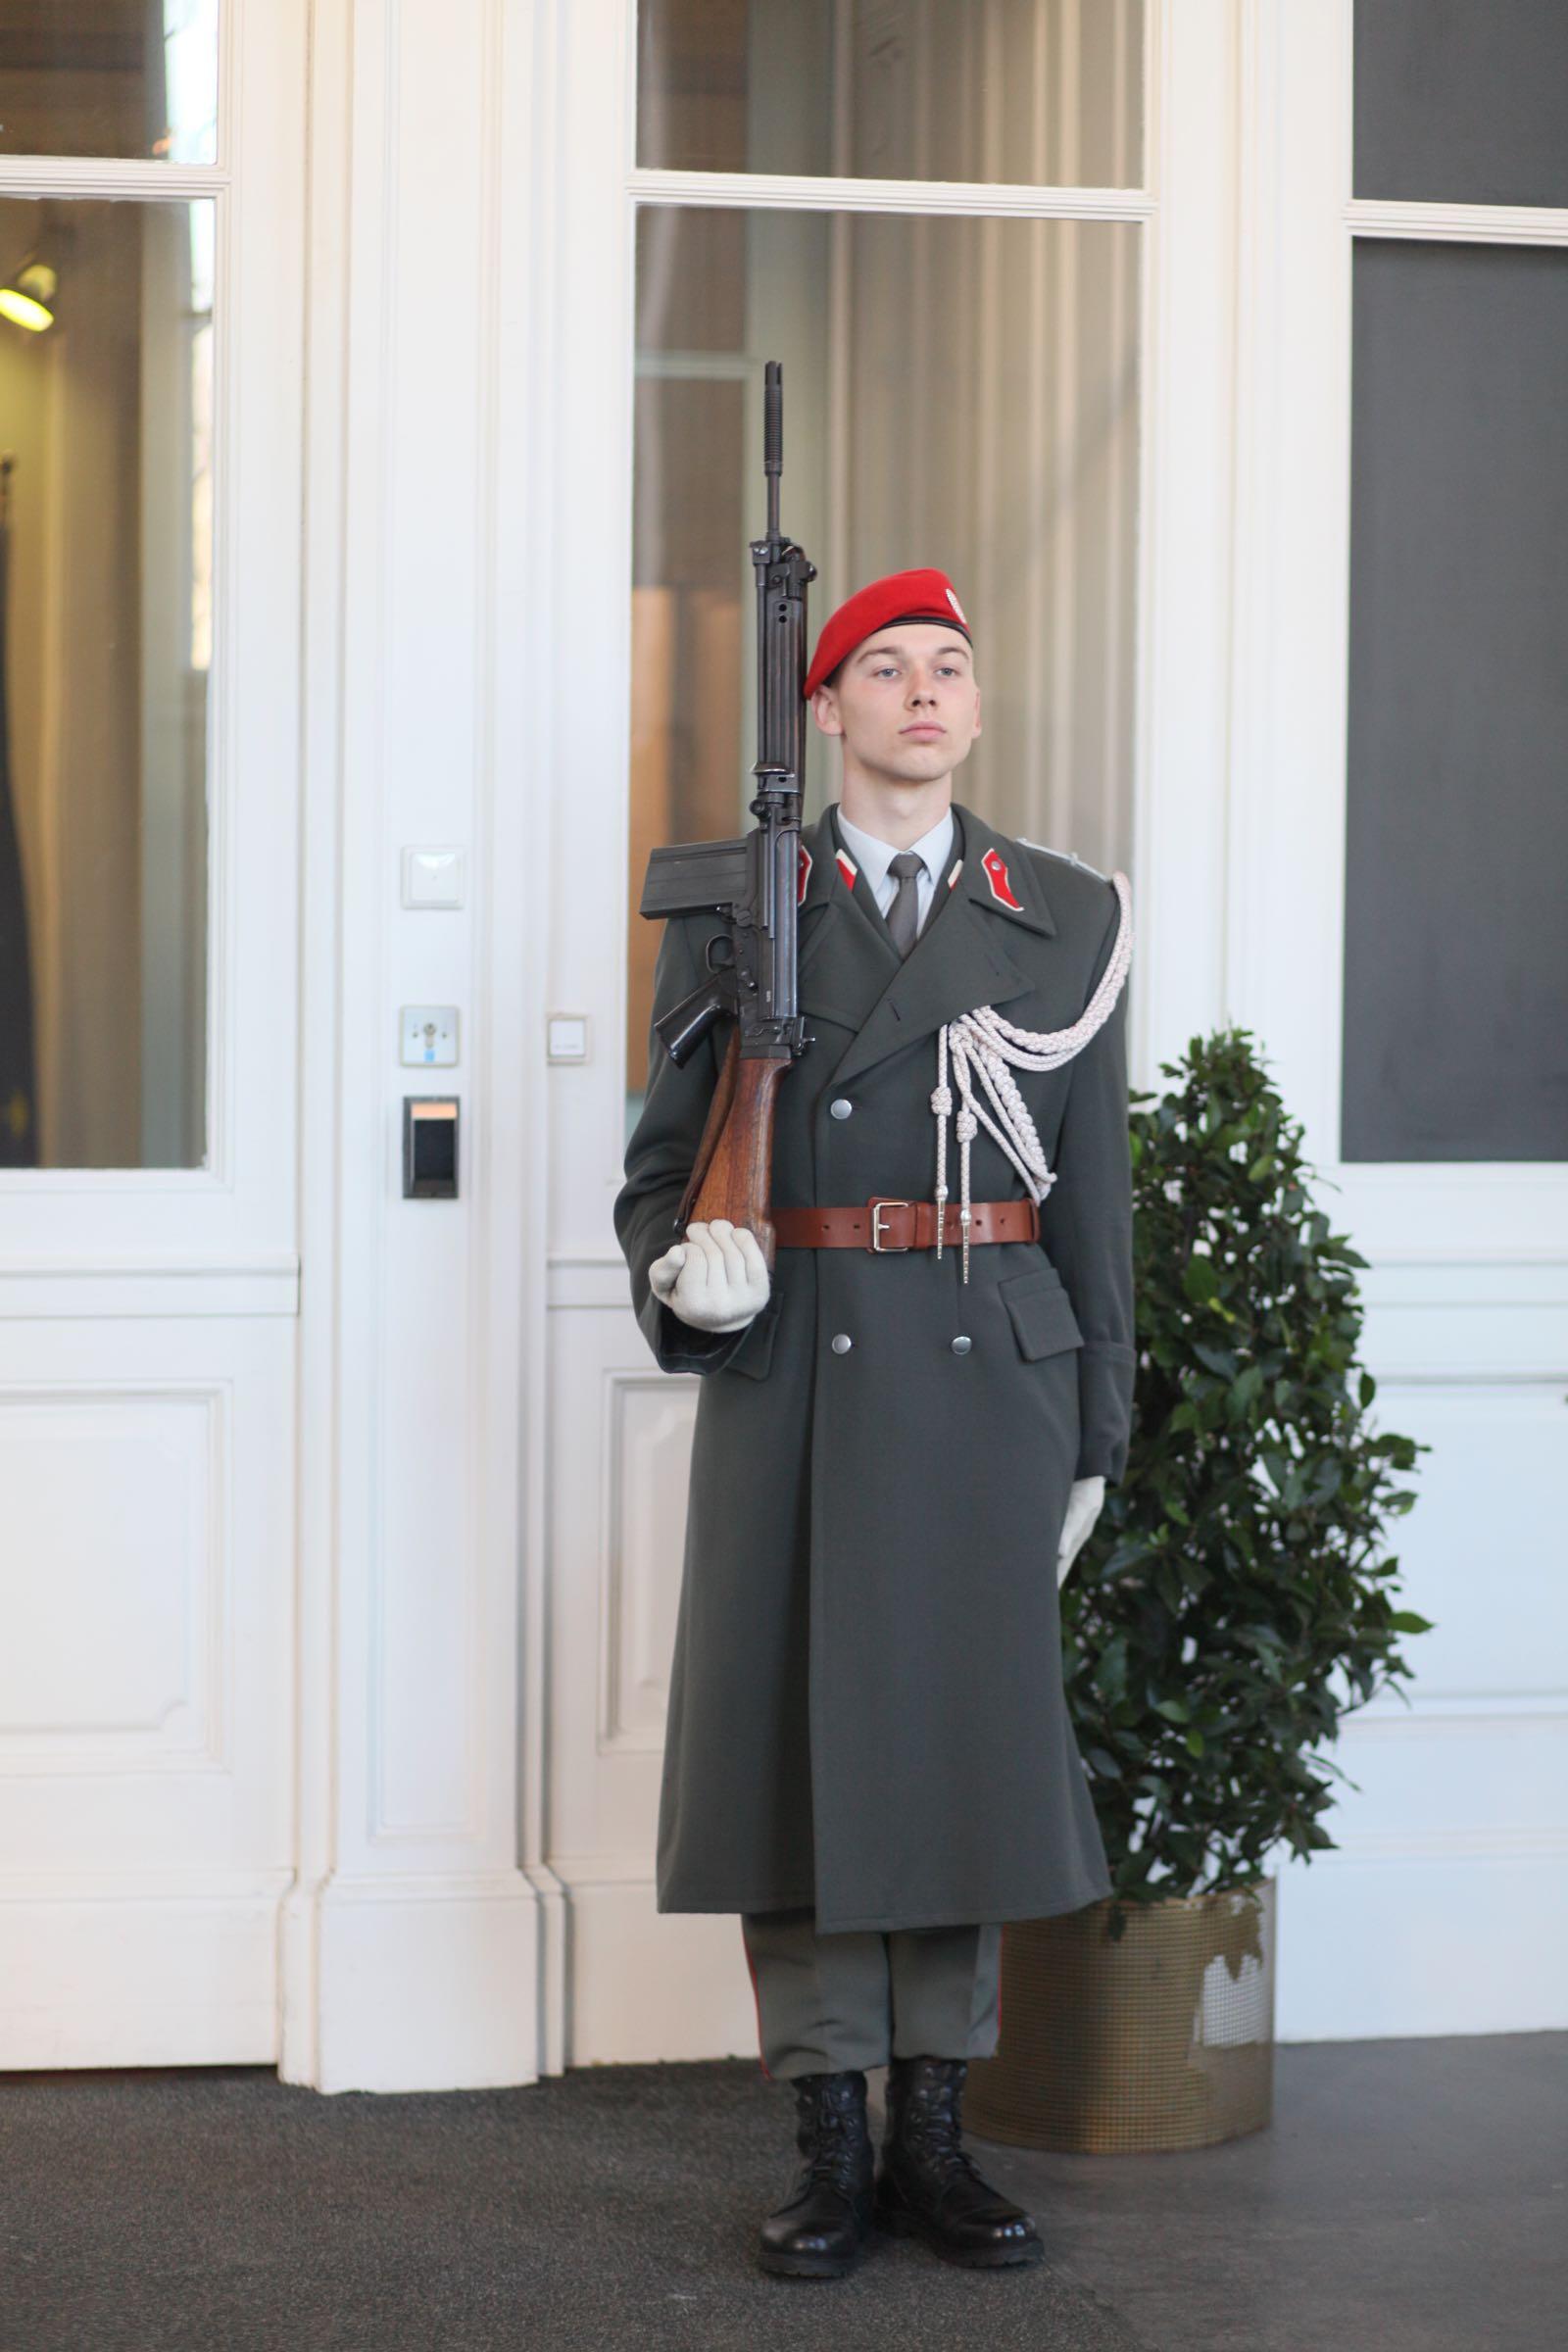 2019_02_05_Garde_Treppenspalier_Hofburg - 3 of 9